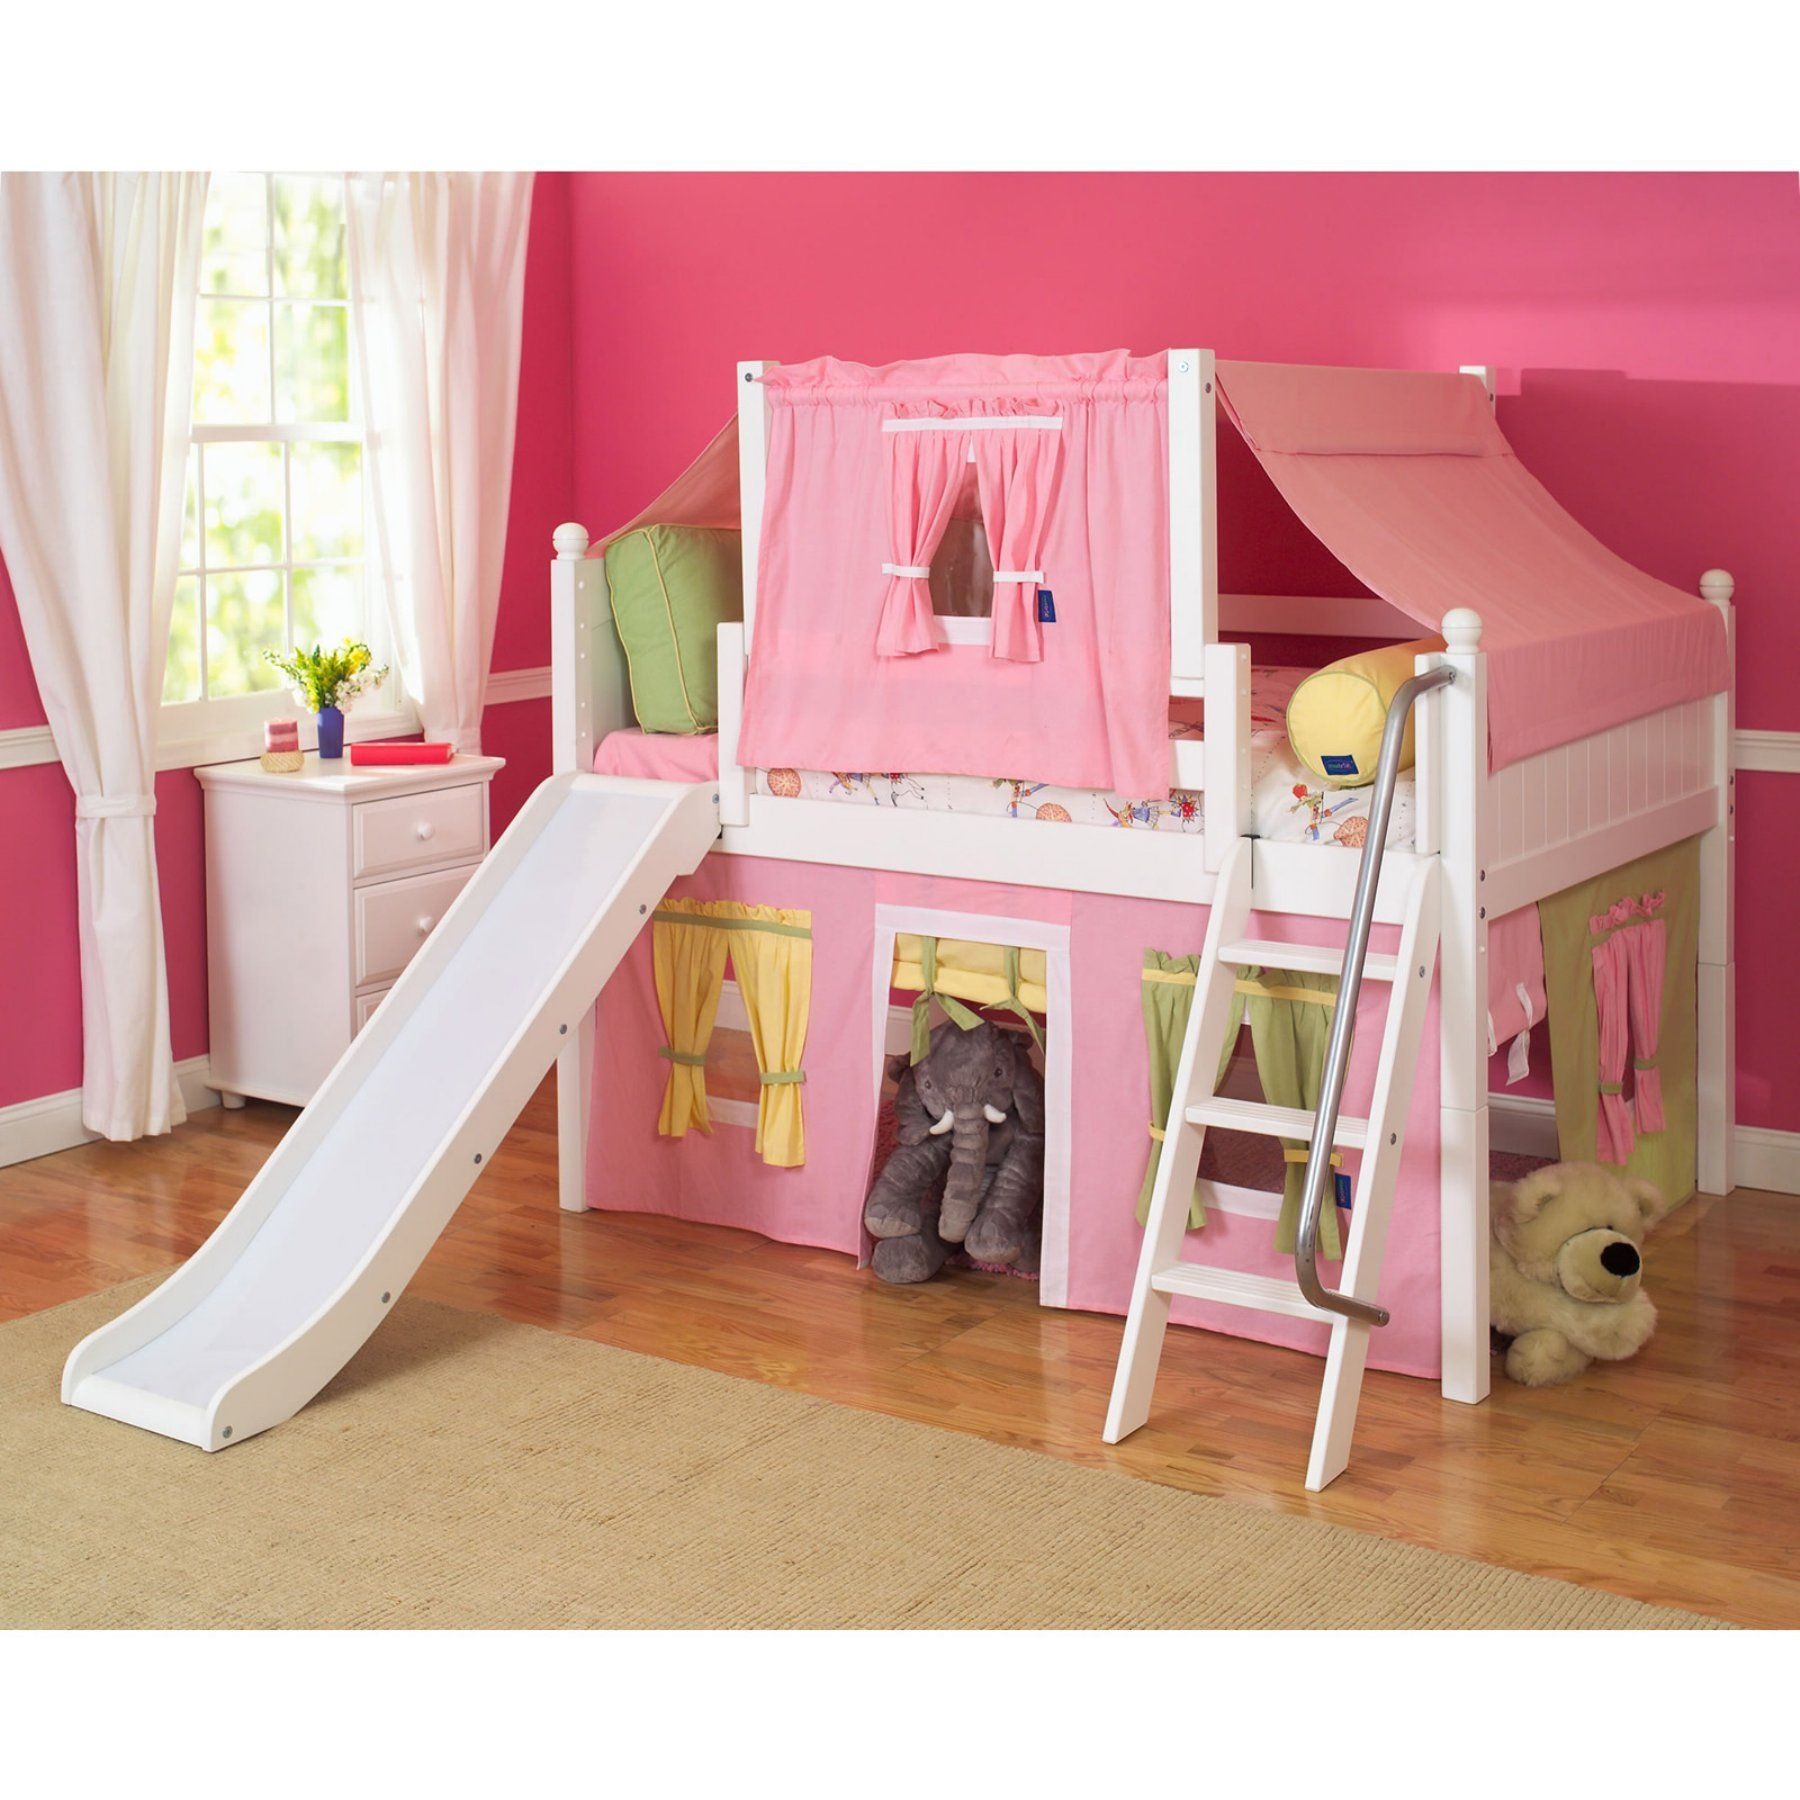 Loft bunk bed with slide  Wow Girl II Deluxe Panel Low Loft Tent Bed with Slide  MXTX